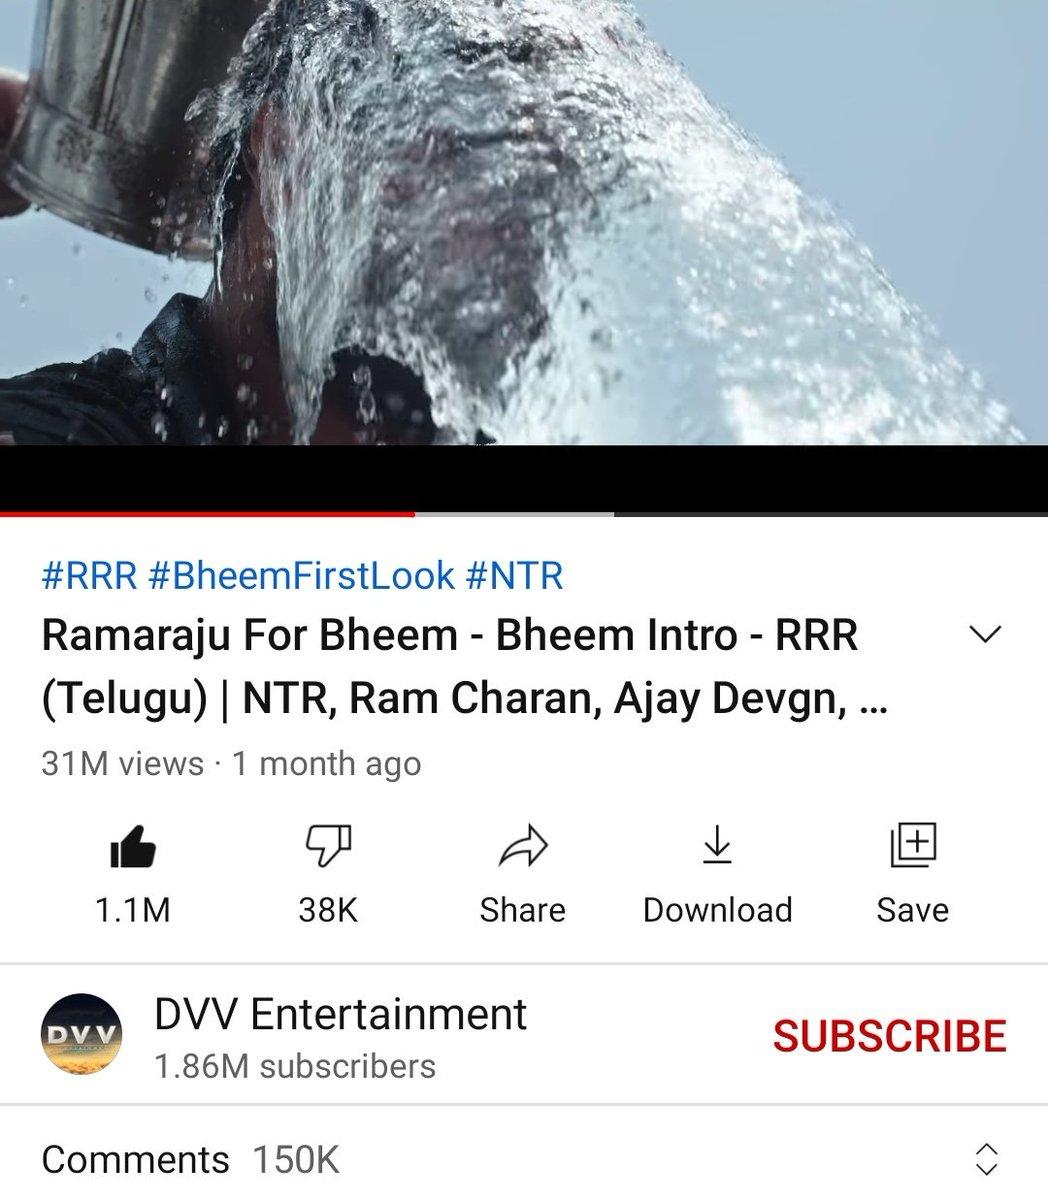 1️⃣5️⃣0️⃣ K comments done on #RamarajuForBheem   First and fastest 1️⃣5️⃣0️⃣K commented teaser in TFI   #KomaramBheemNTR    @tarak9999